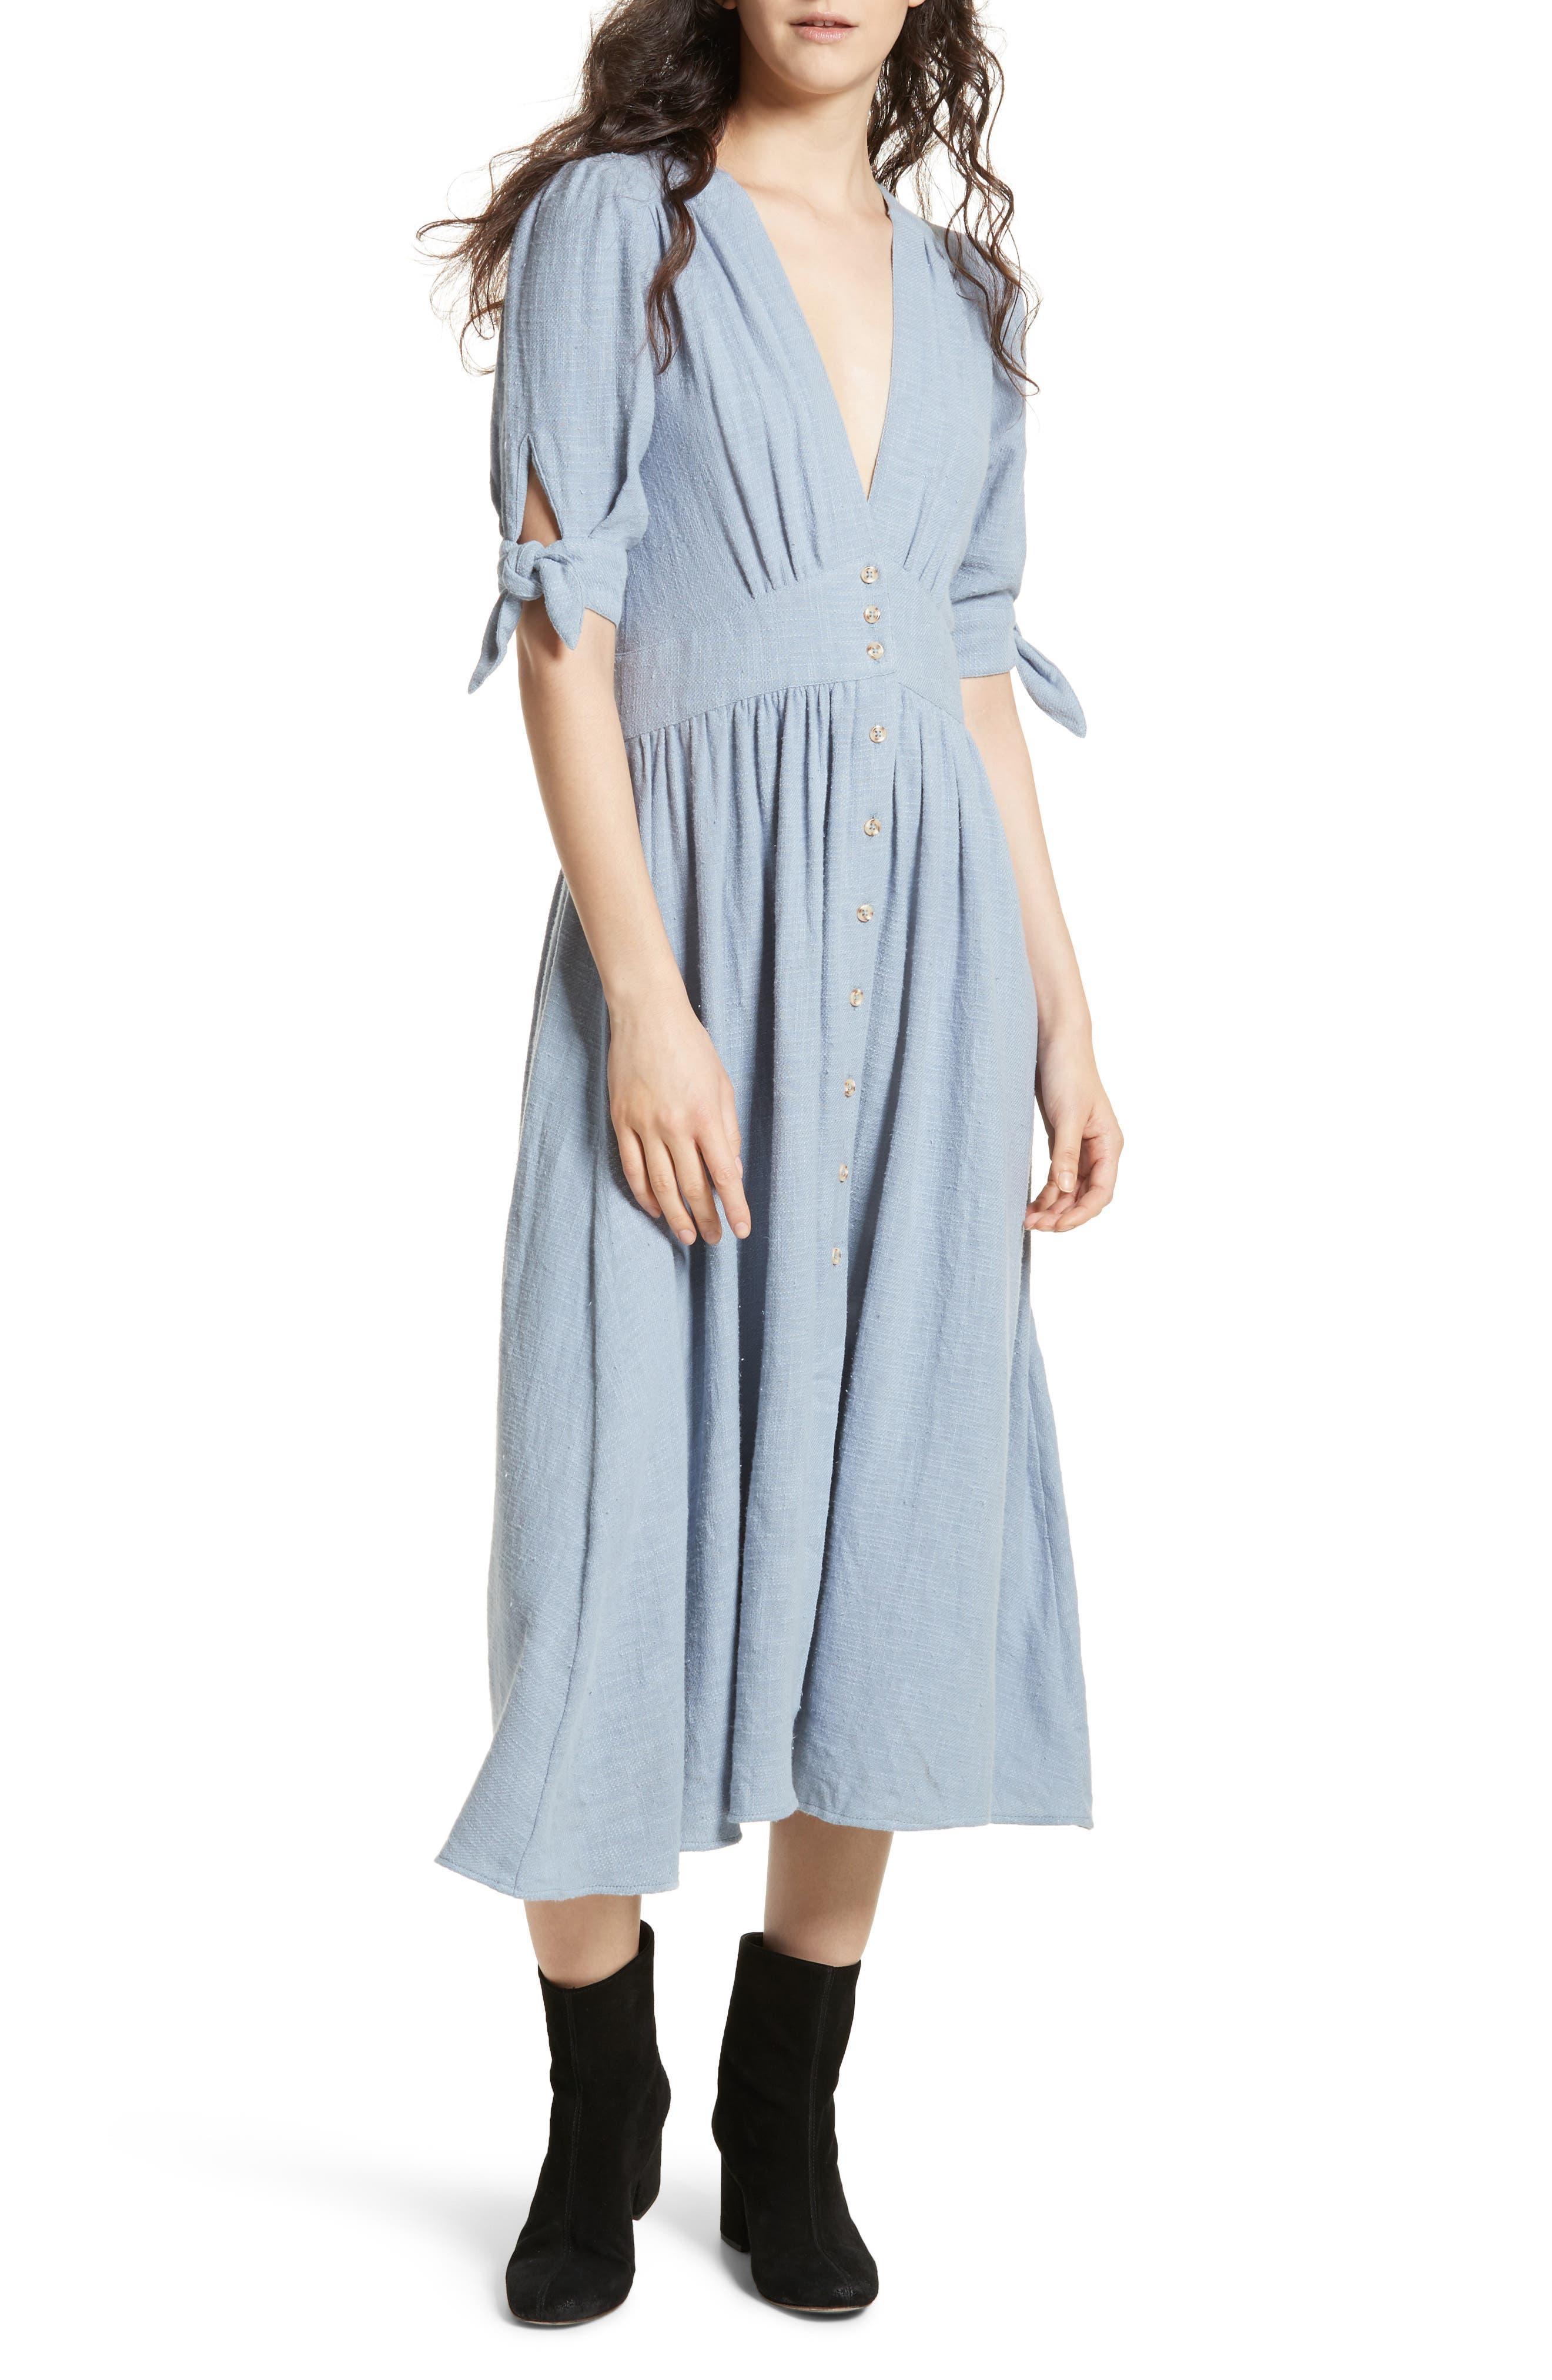 Love of My Life Midi Dress,                             Main thumbnail 1, color,                             BLUE